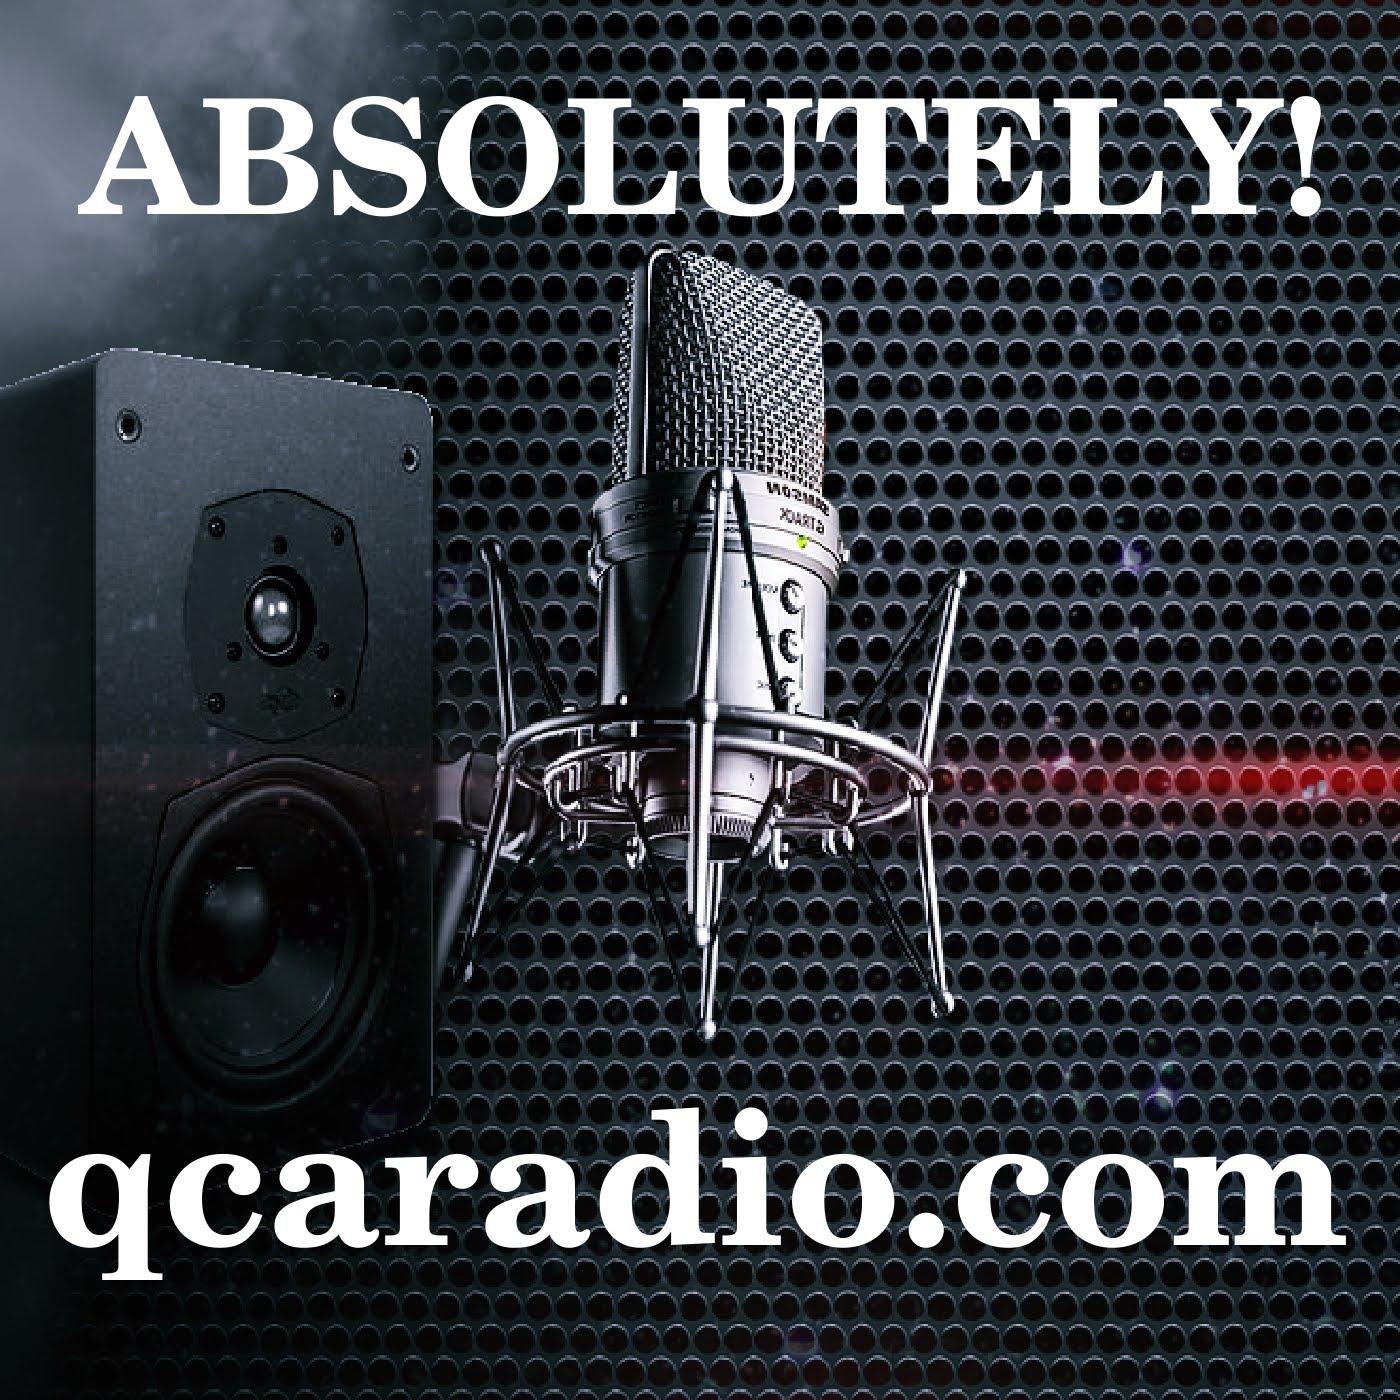 Quad Cities Anglican Radio!